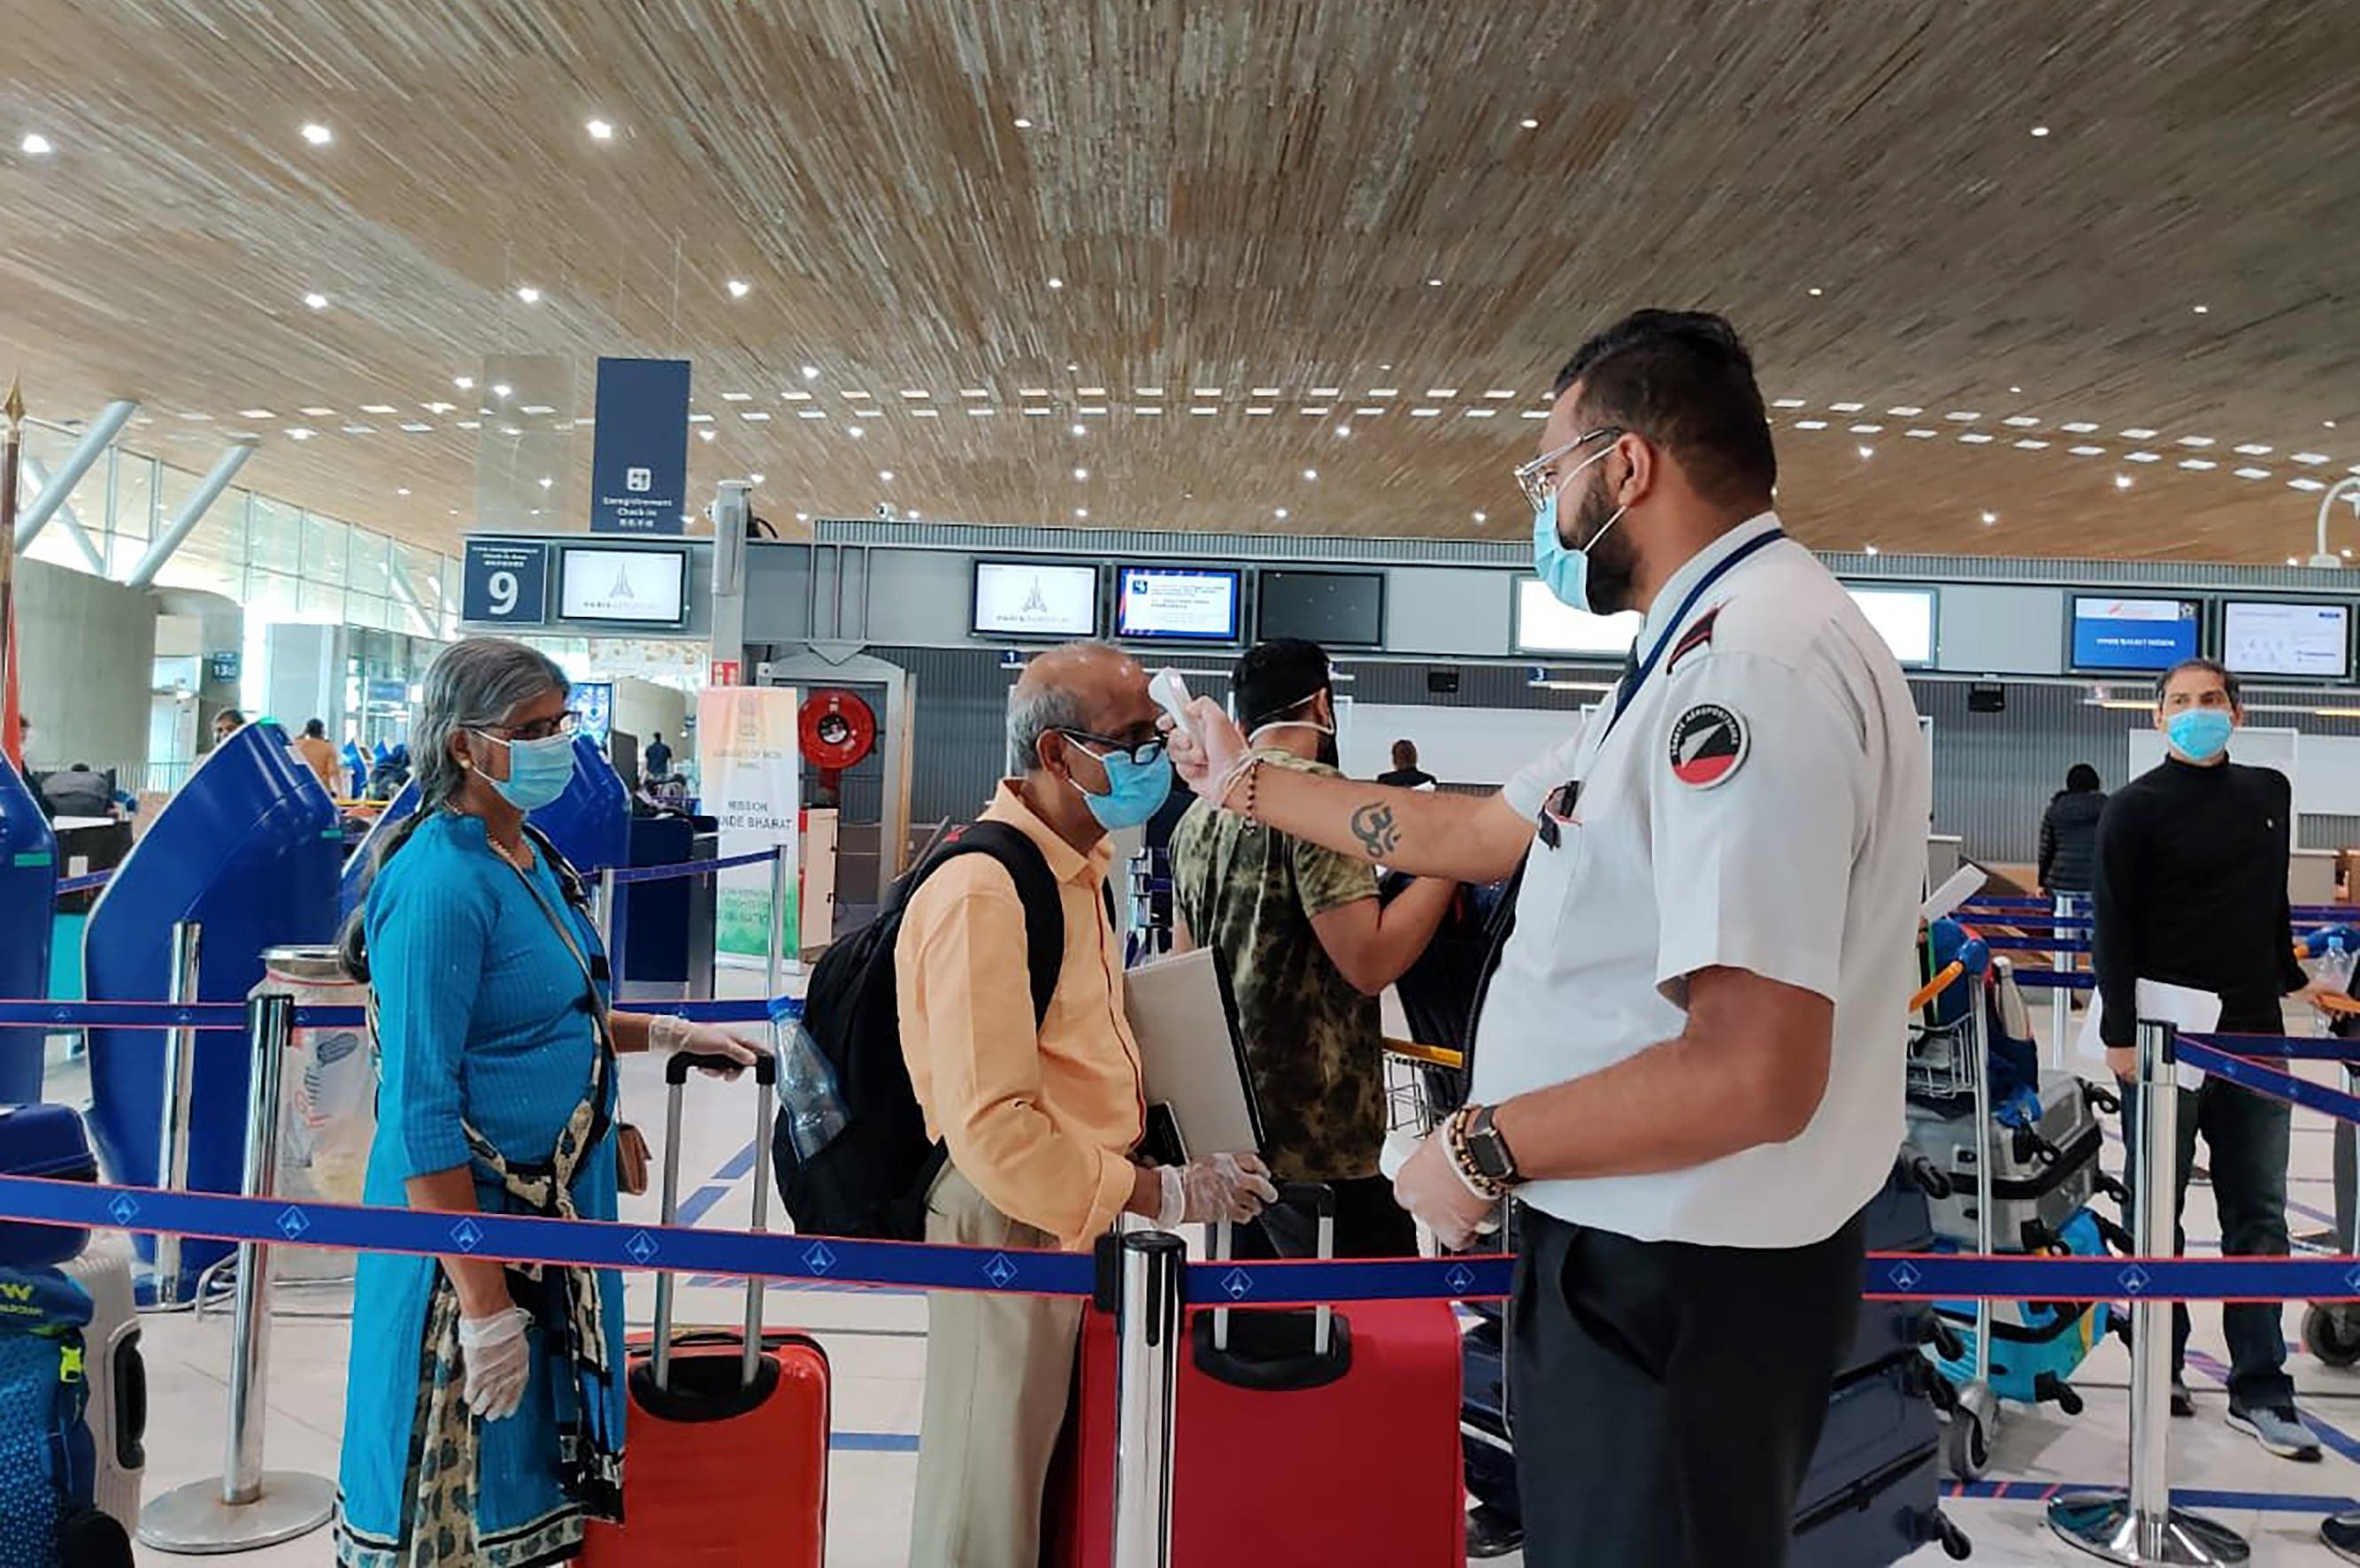 India Coronavirus Dispatch: Travel agencies plan 'vaccine tourism' packages  | Business Standard News